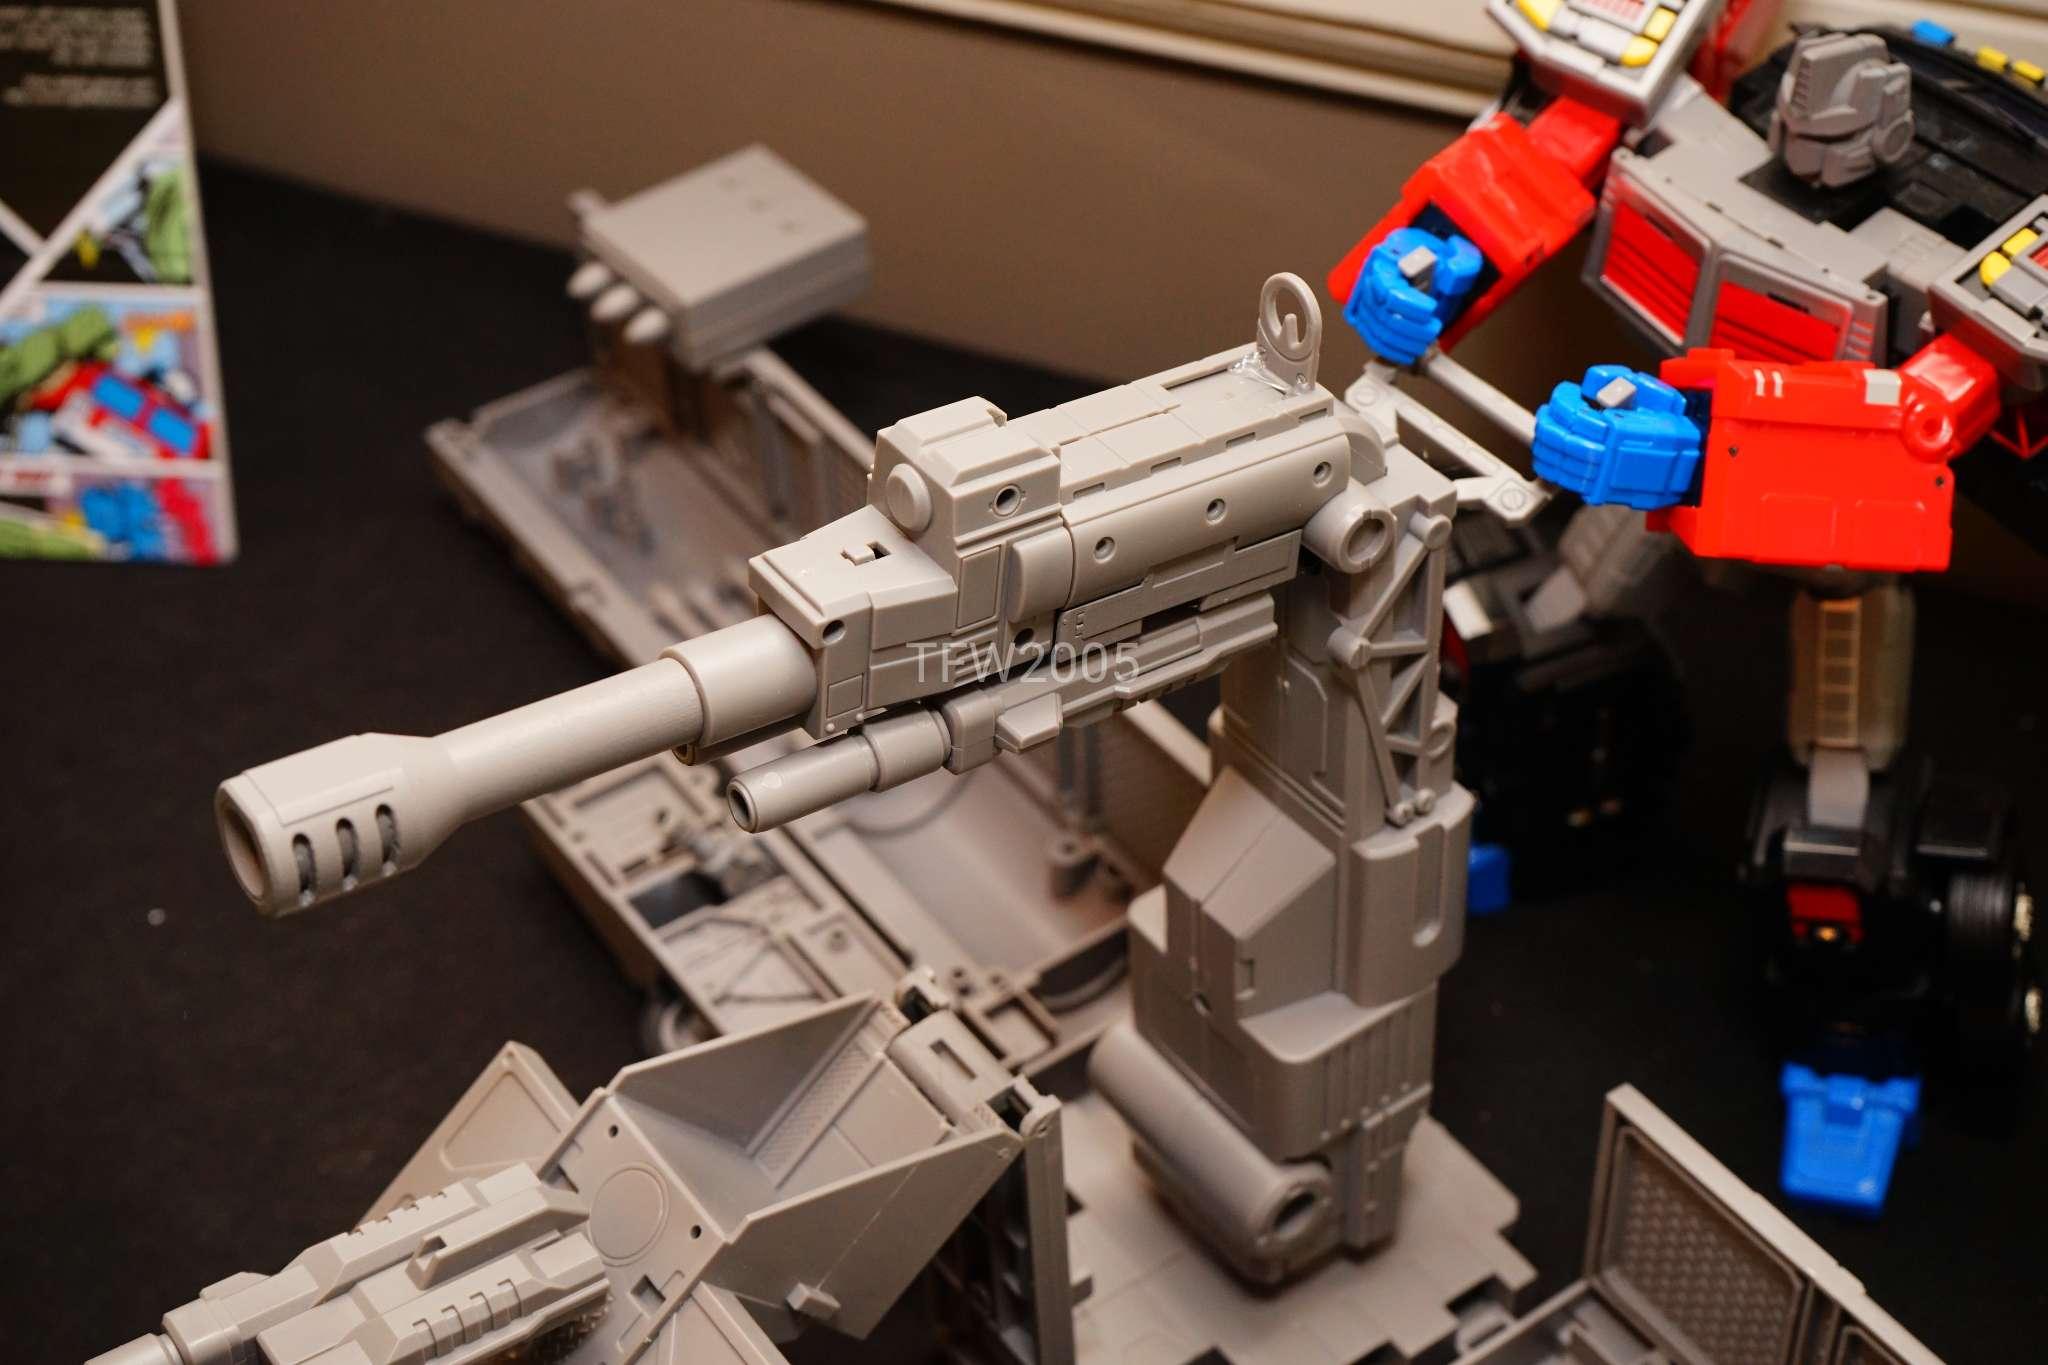 [FansHobby] Produit Tiers - Master Builder MB-01 Archenemy (aka Scourge RID 2000),  MB-04 Gunfighter II (aka Laser Optimus G2) et MB-09 Trailer (remorque) - Page 2 Oes3u4H1_o